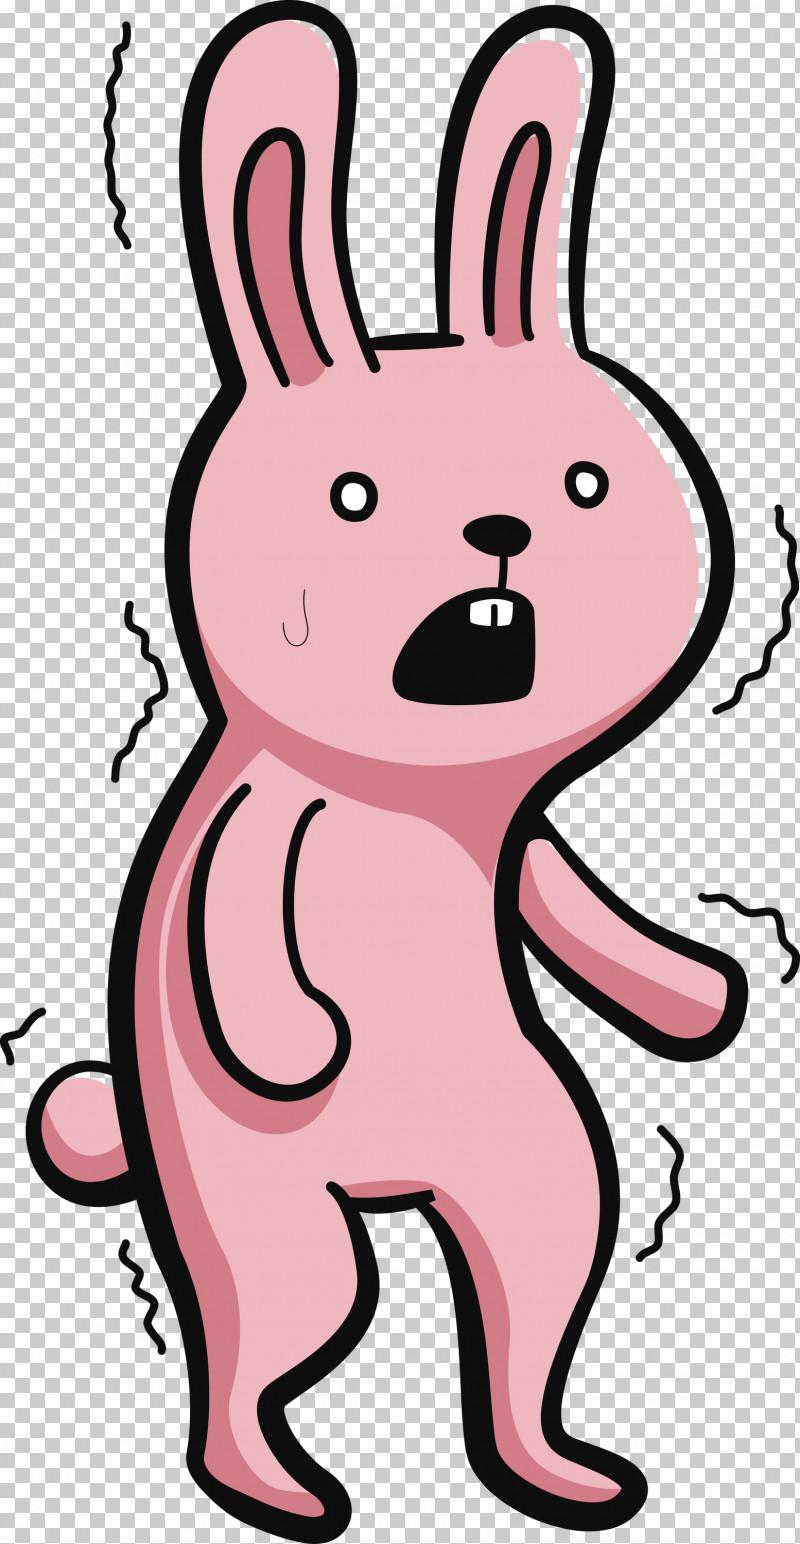 Hares Snout Whiskers Rabbit Cartoon PNG, Clipart, Animal Figurine, Cartoon, Cartoon Rabbit, Character, Cute Rabbit Free PNG Download